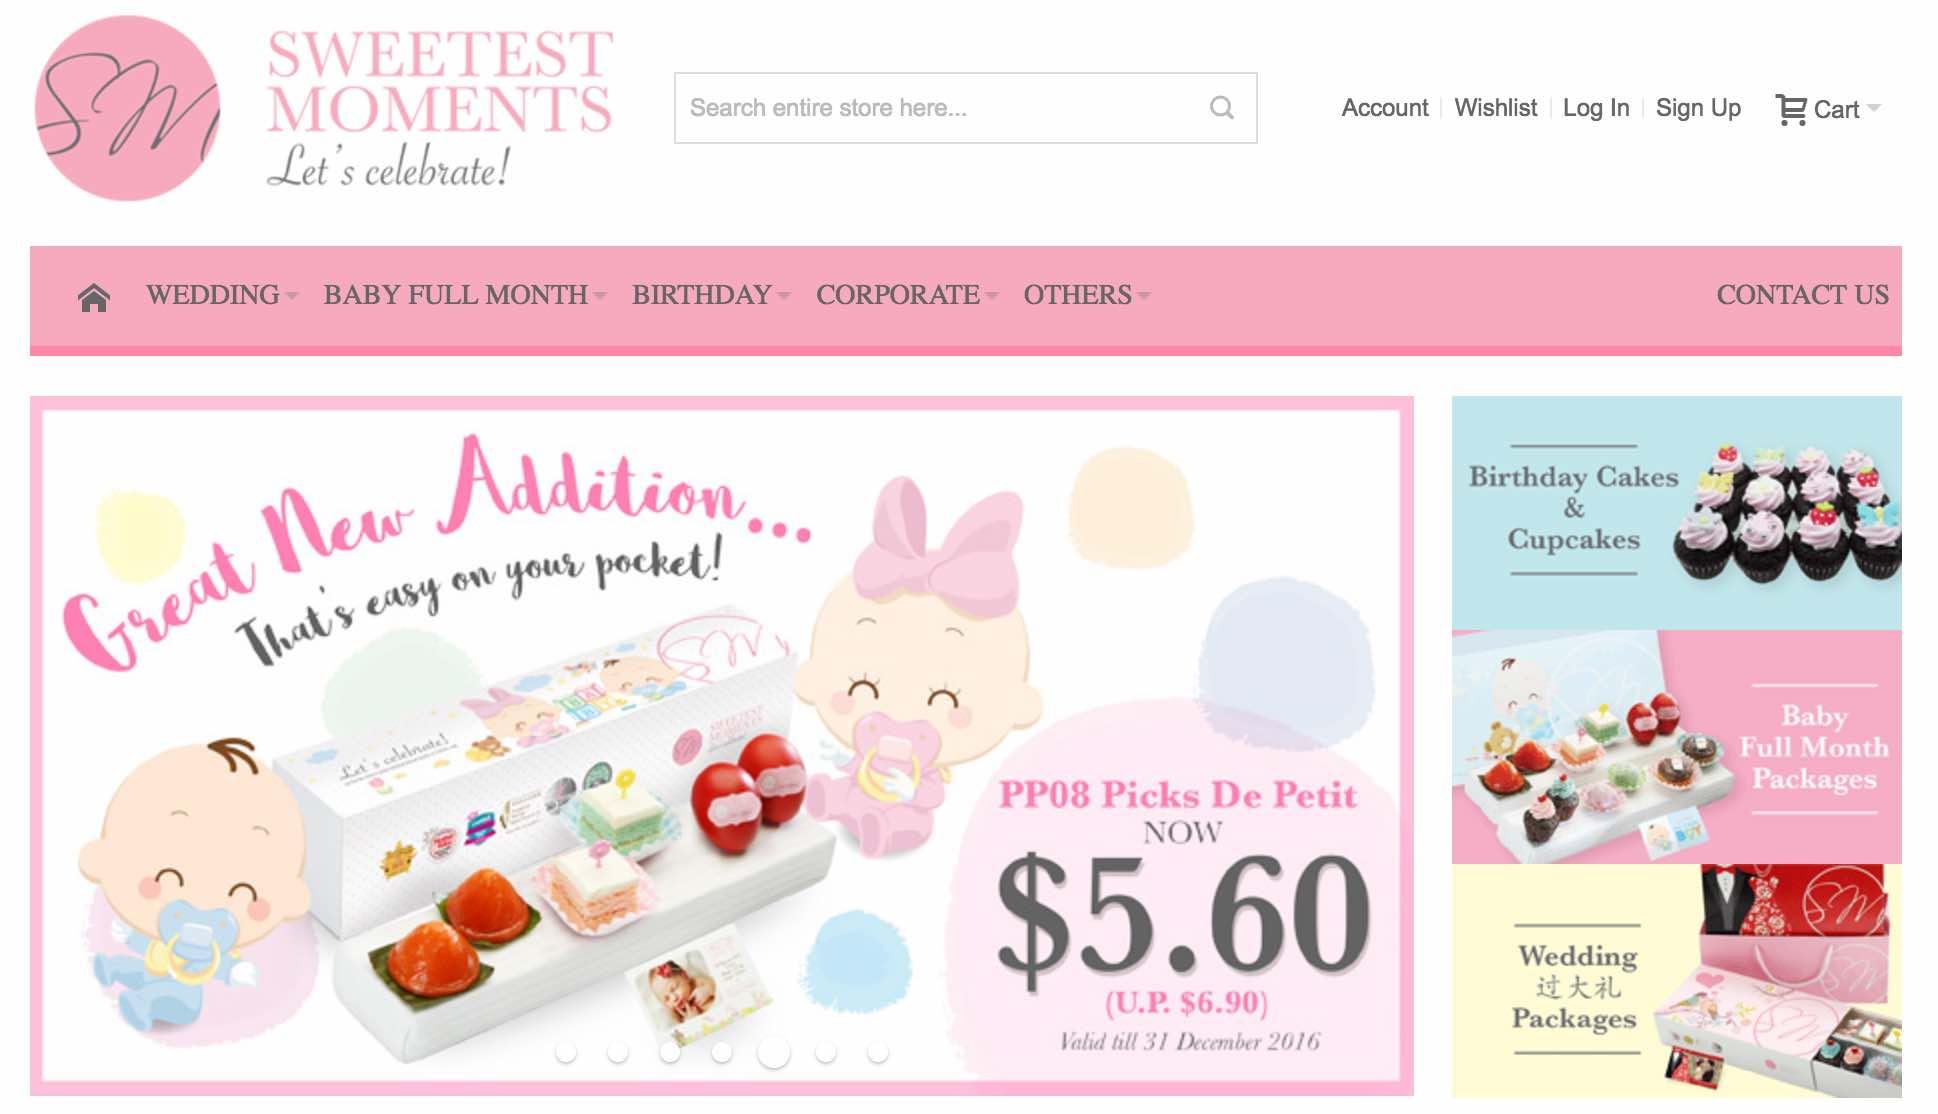 sweetest-moments-website-aspirantsg